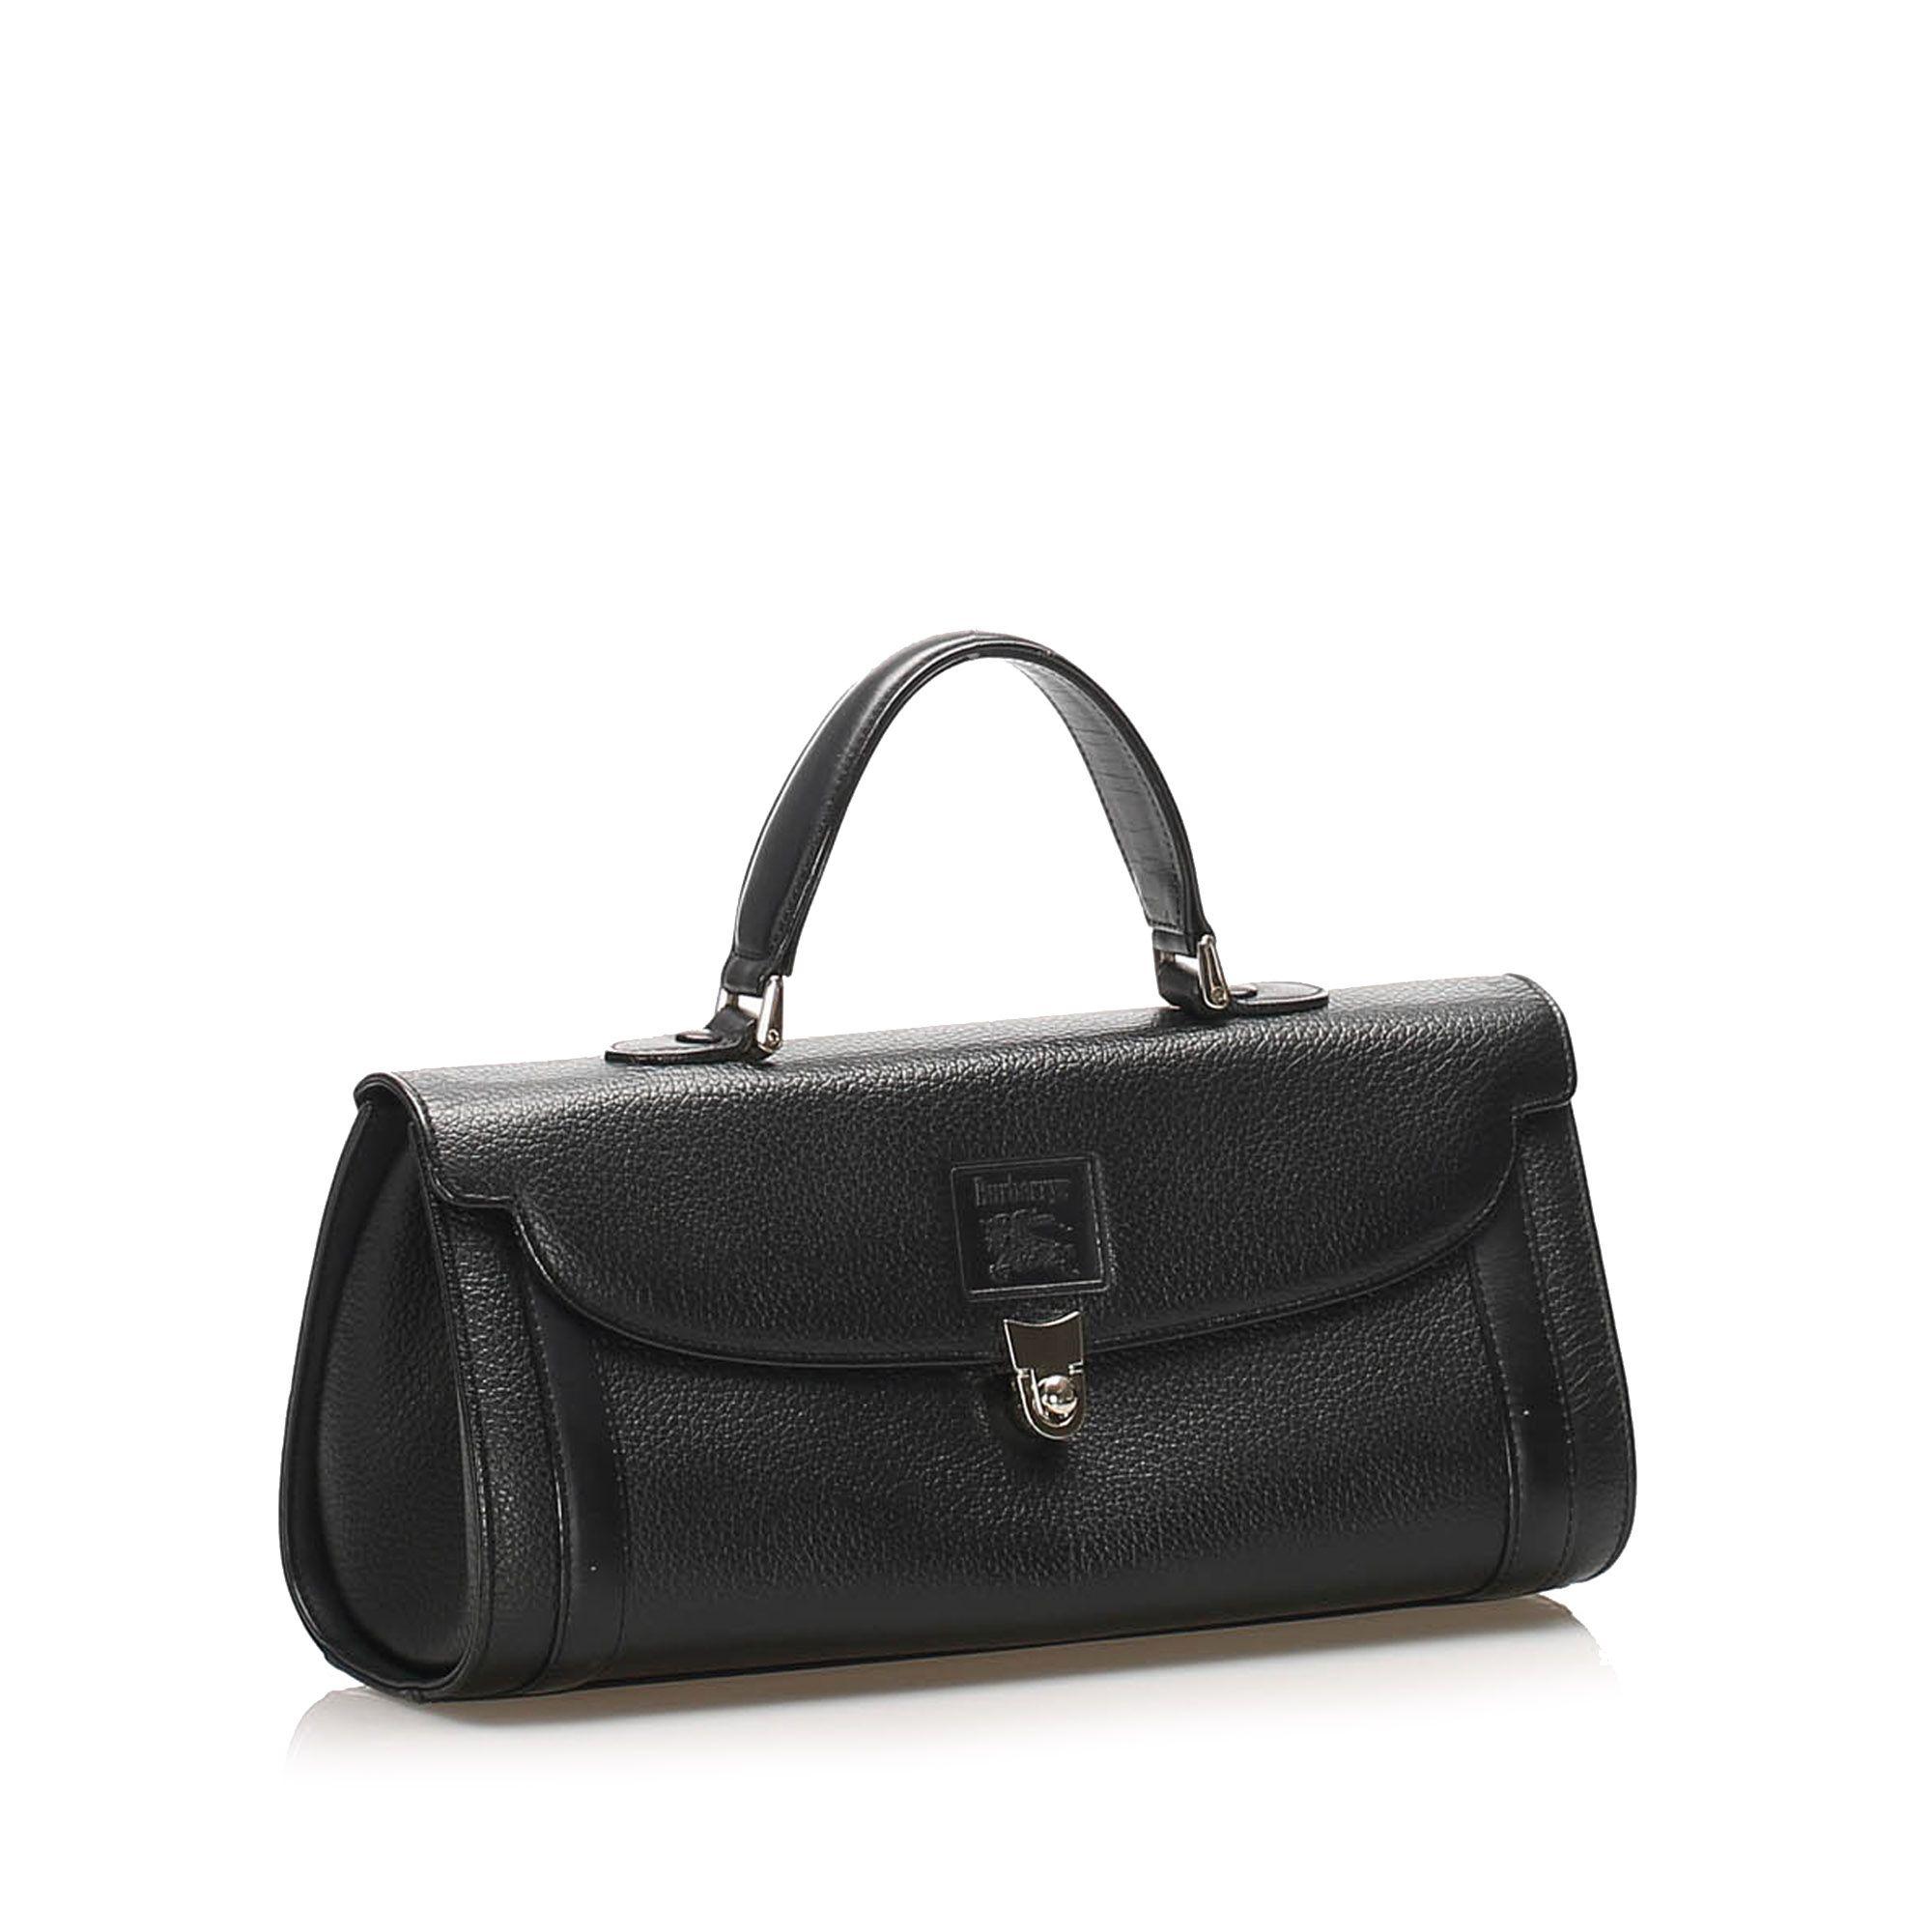 Vintage Burberry Leather Handbag Black